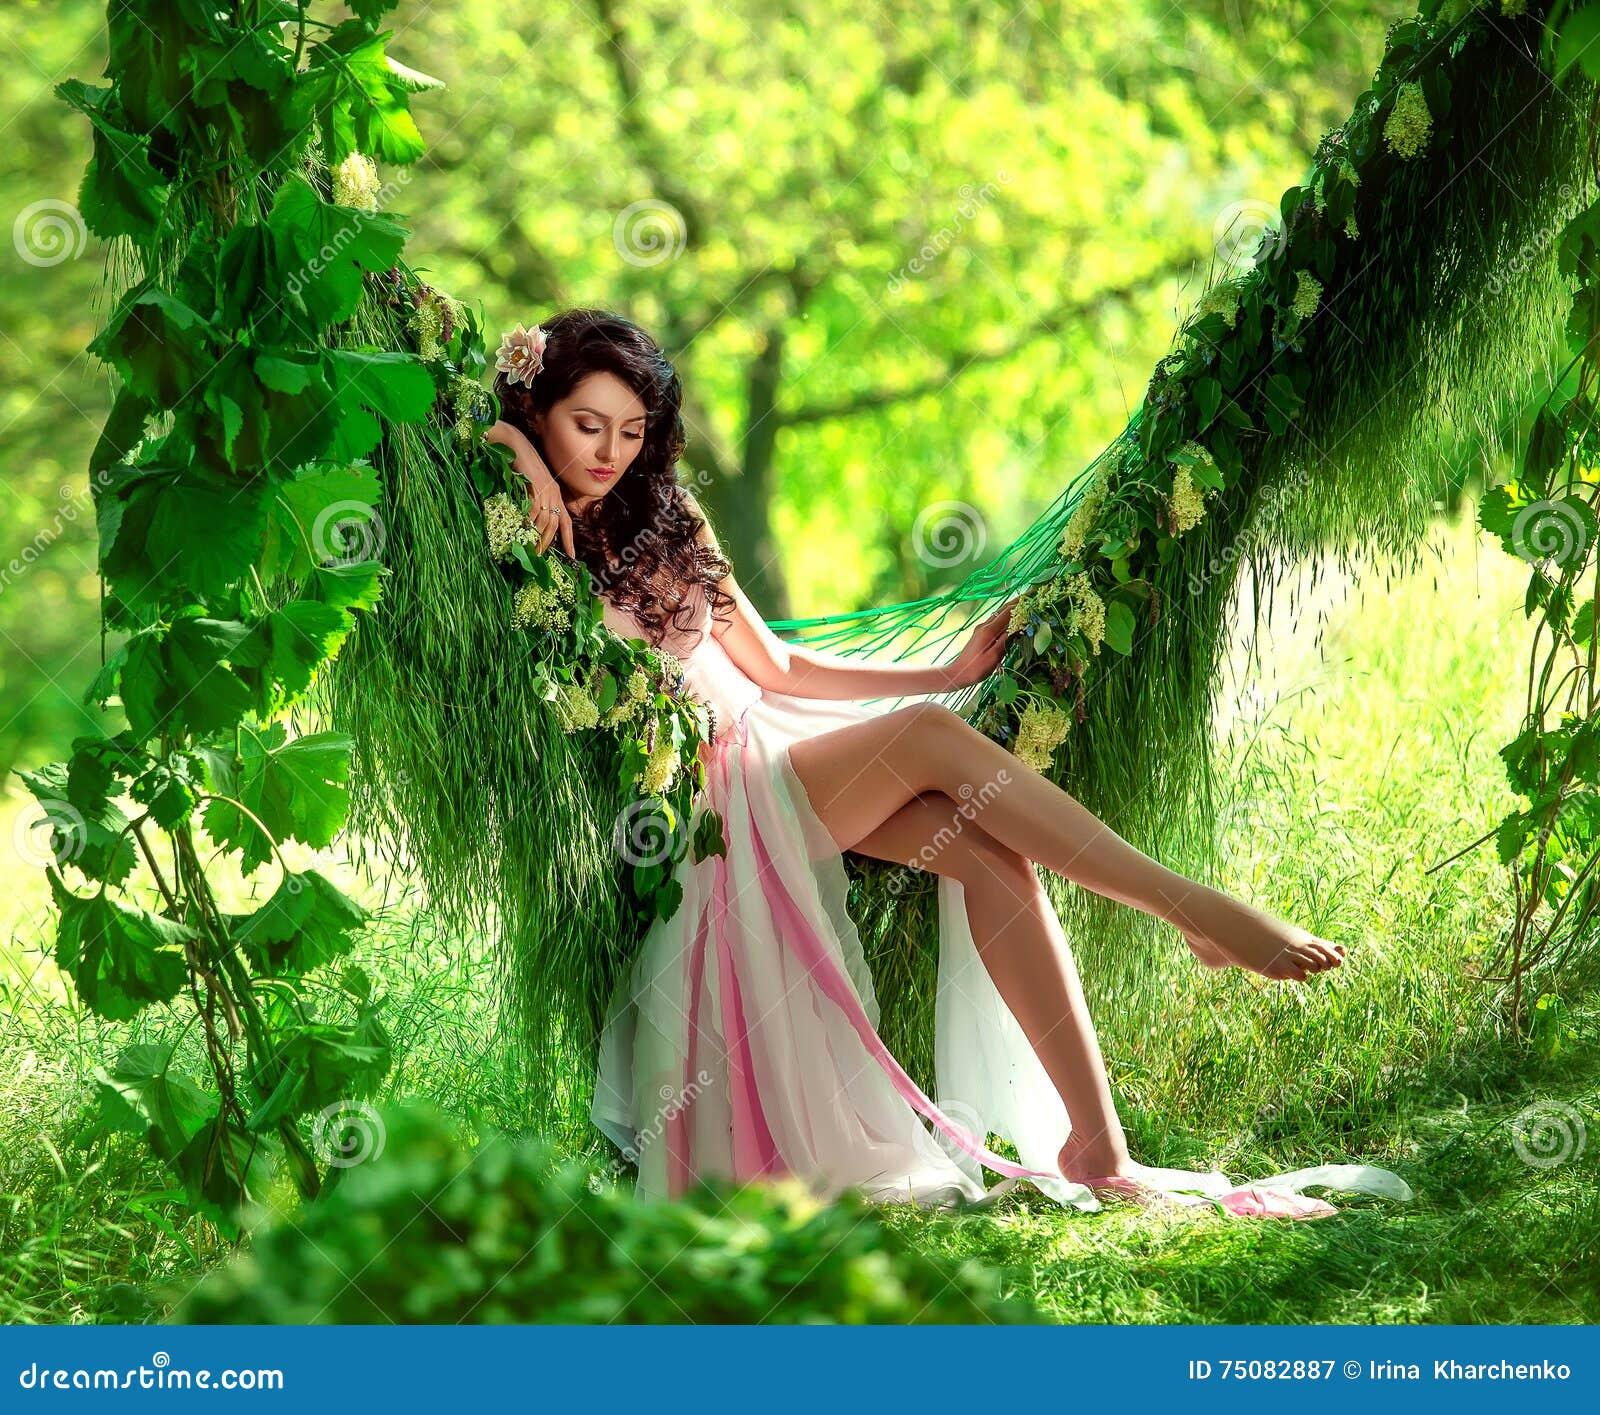 Beautiful Nature Girl Wallpaper: Beautiful Girl In Pale Pink Dress Stock Image